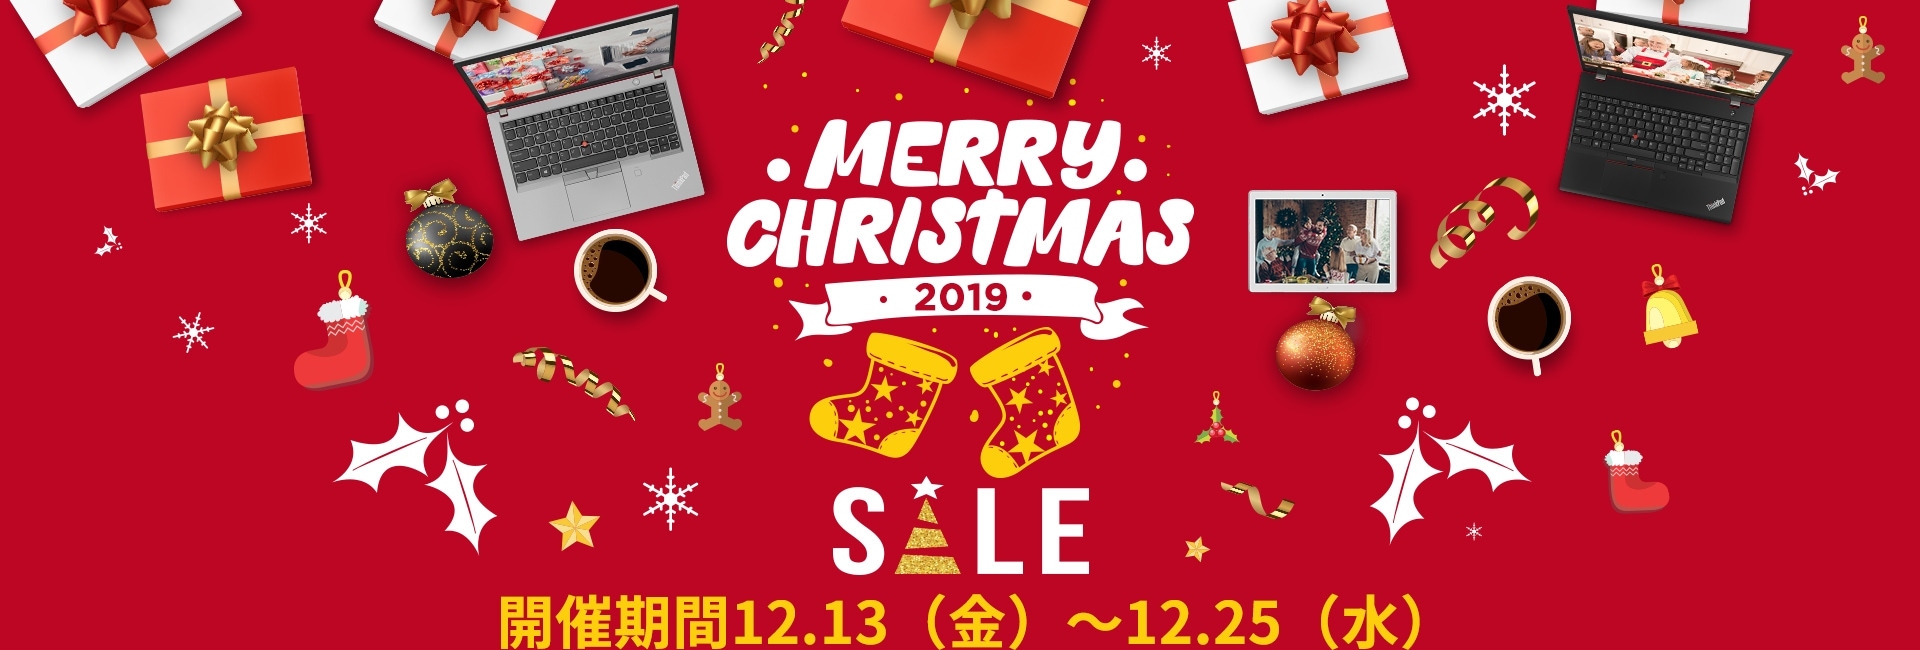 MERRY CHRISTMAS 2019 開催期間12.13(金)~12.25(水)